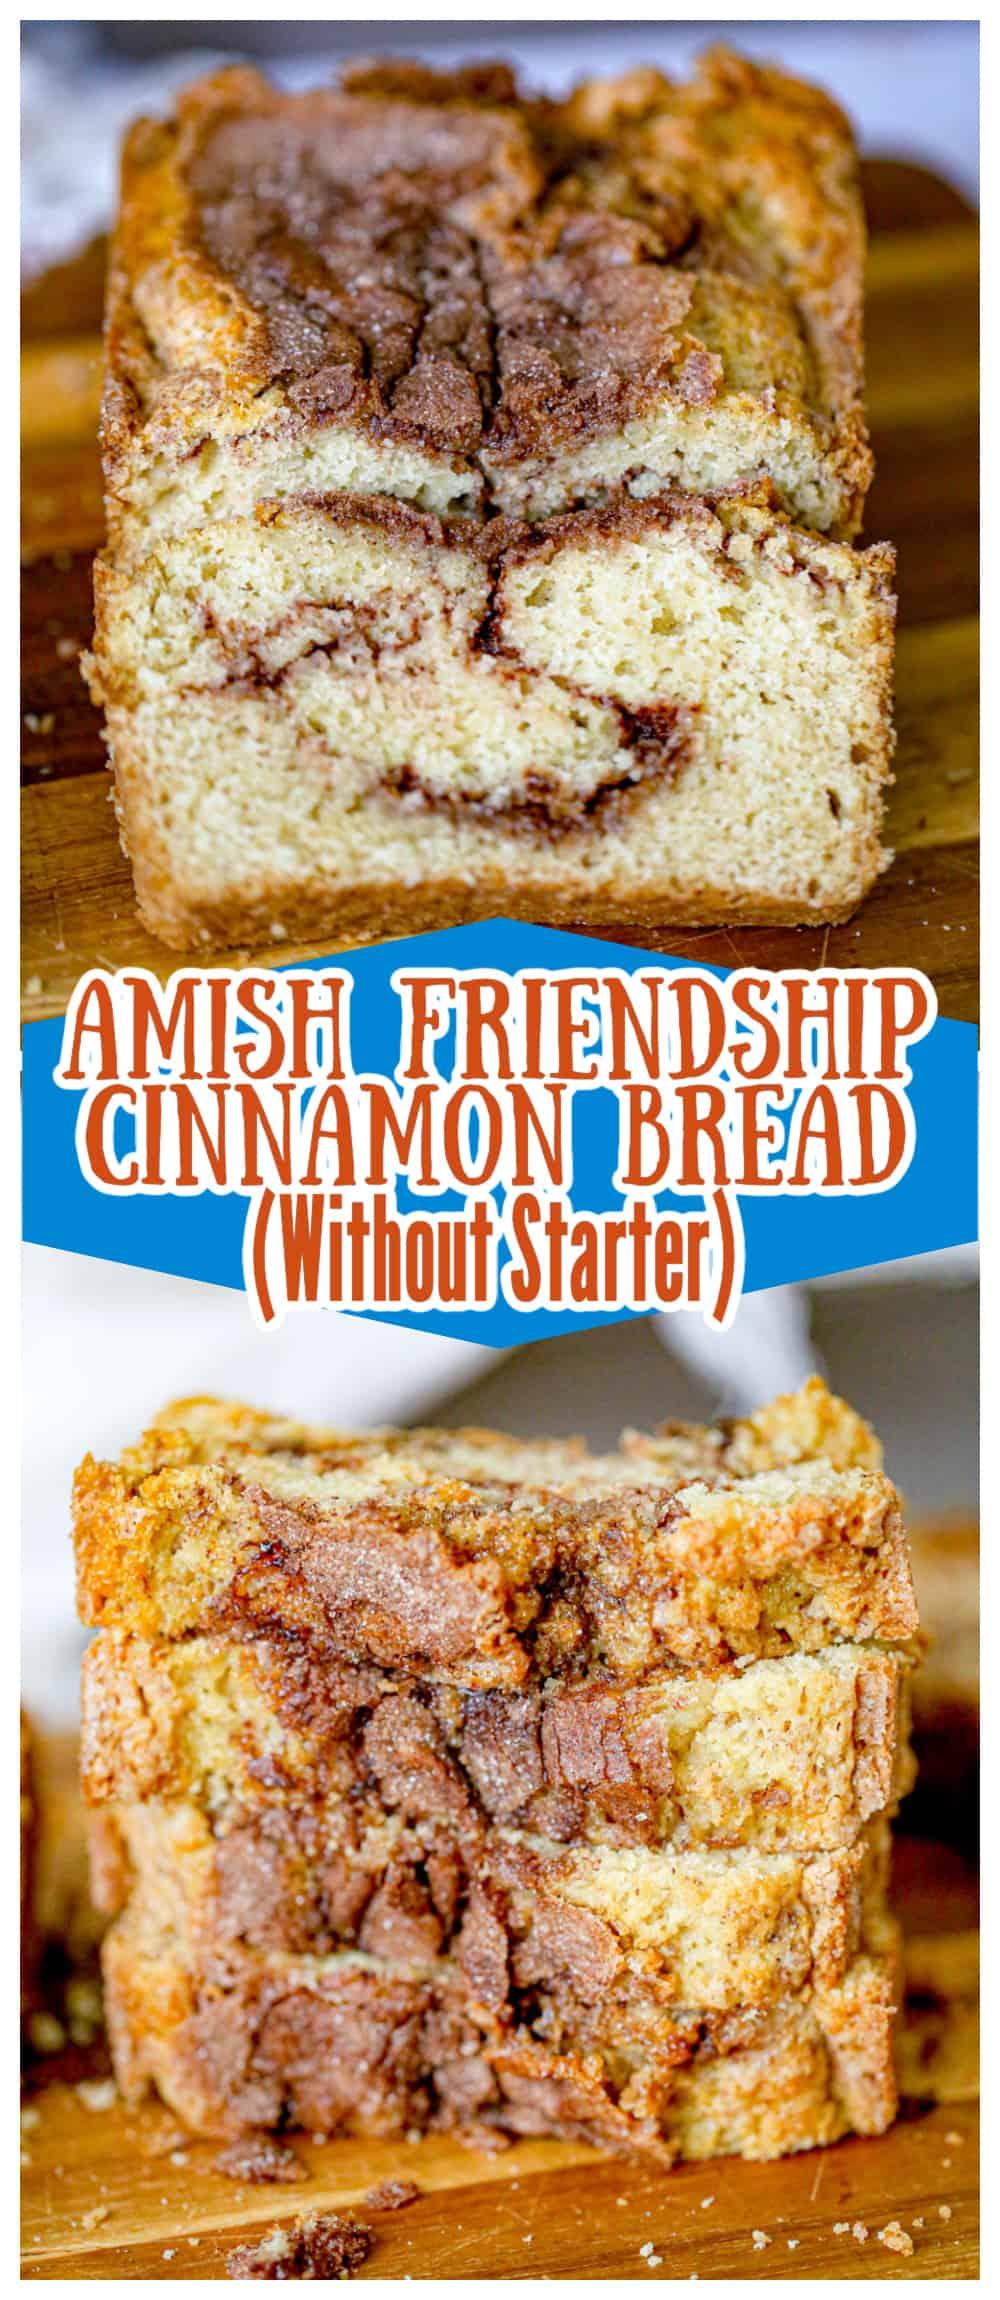 Amish Friendship Cinnamon Bread